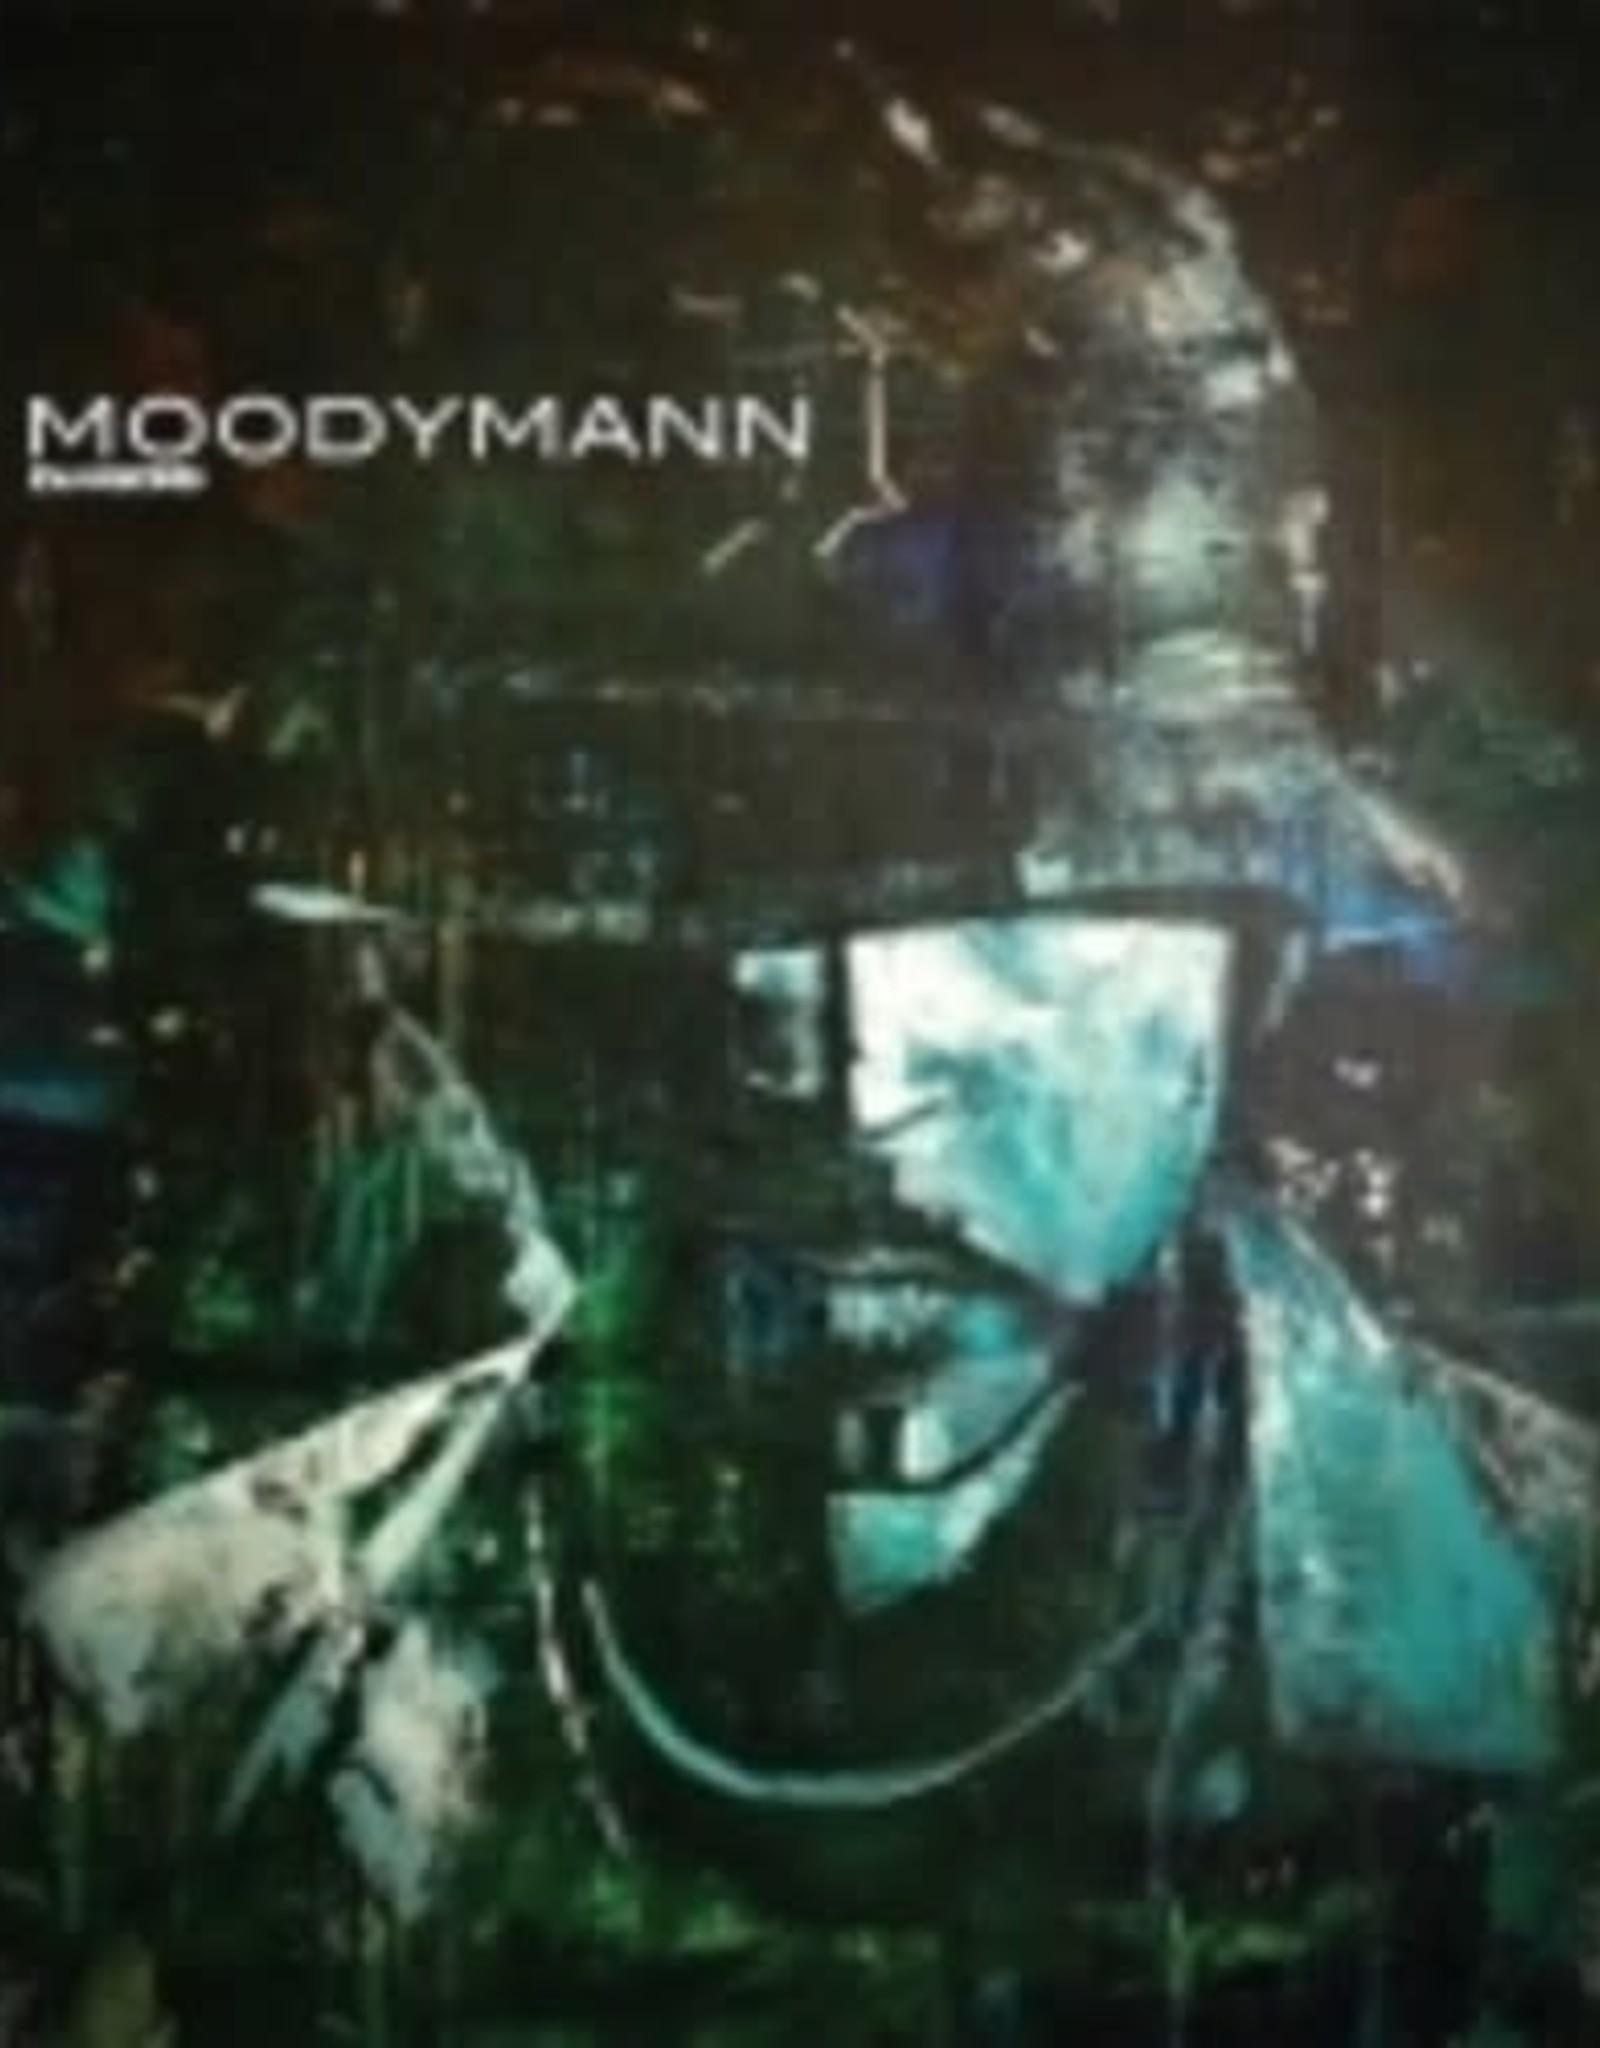 Moodyman - Dj-Kicks